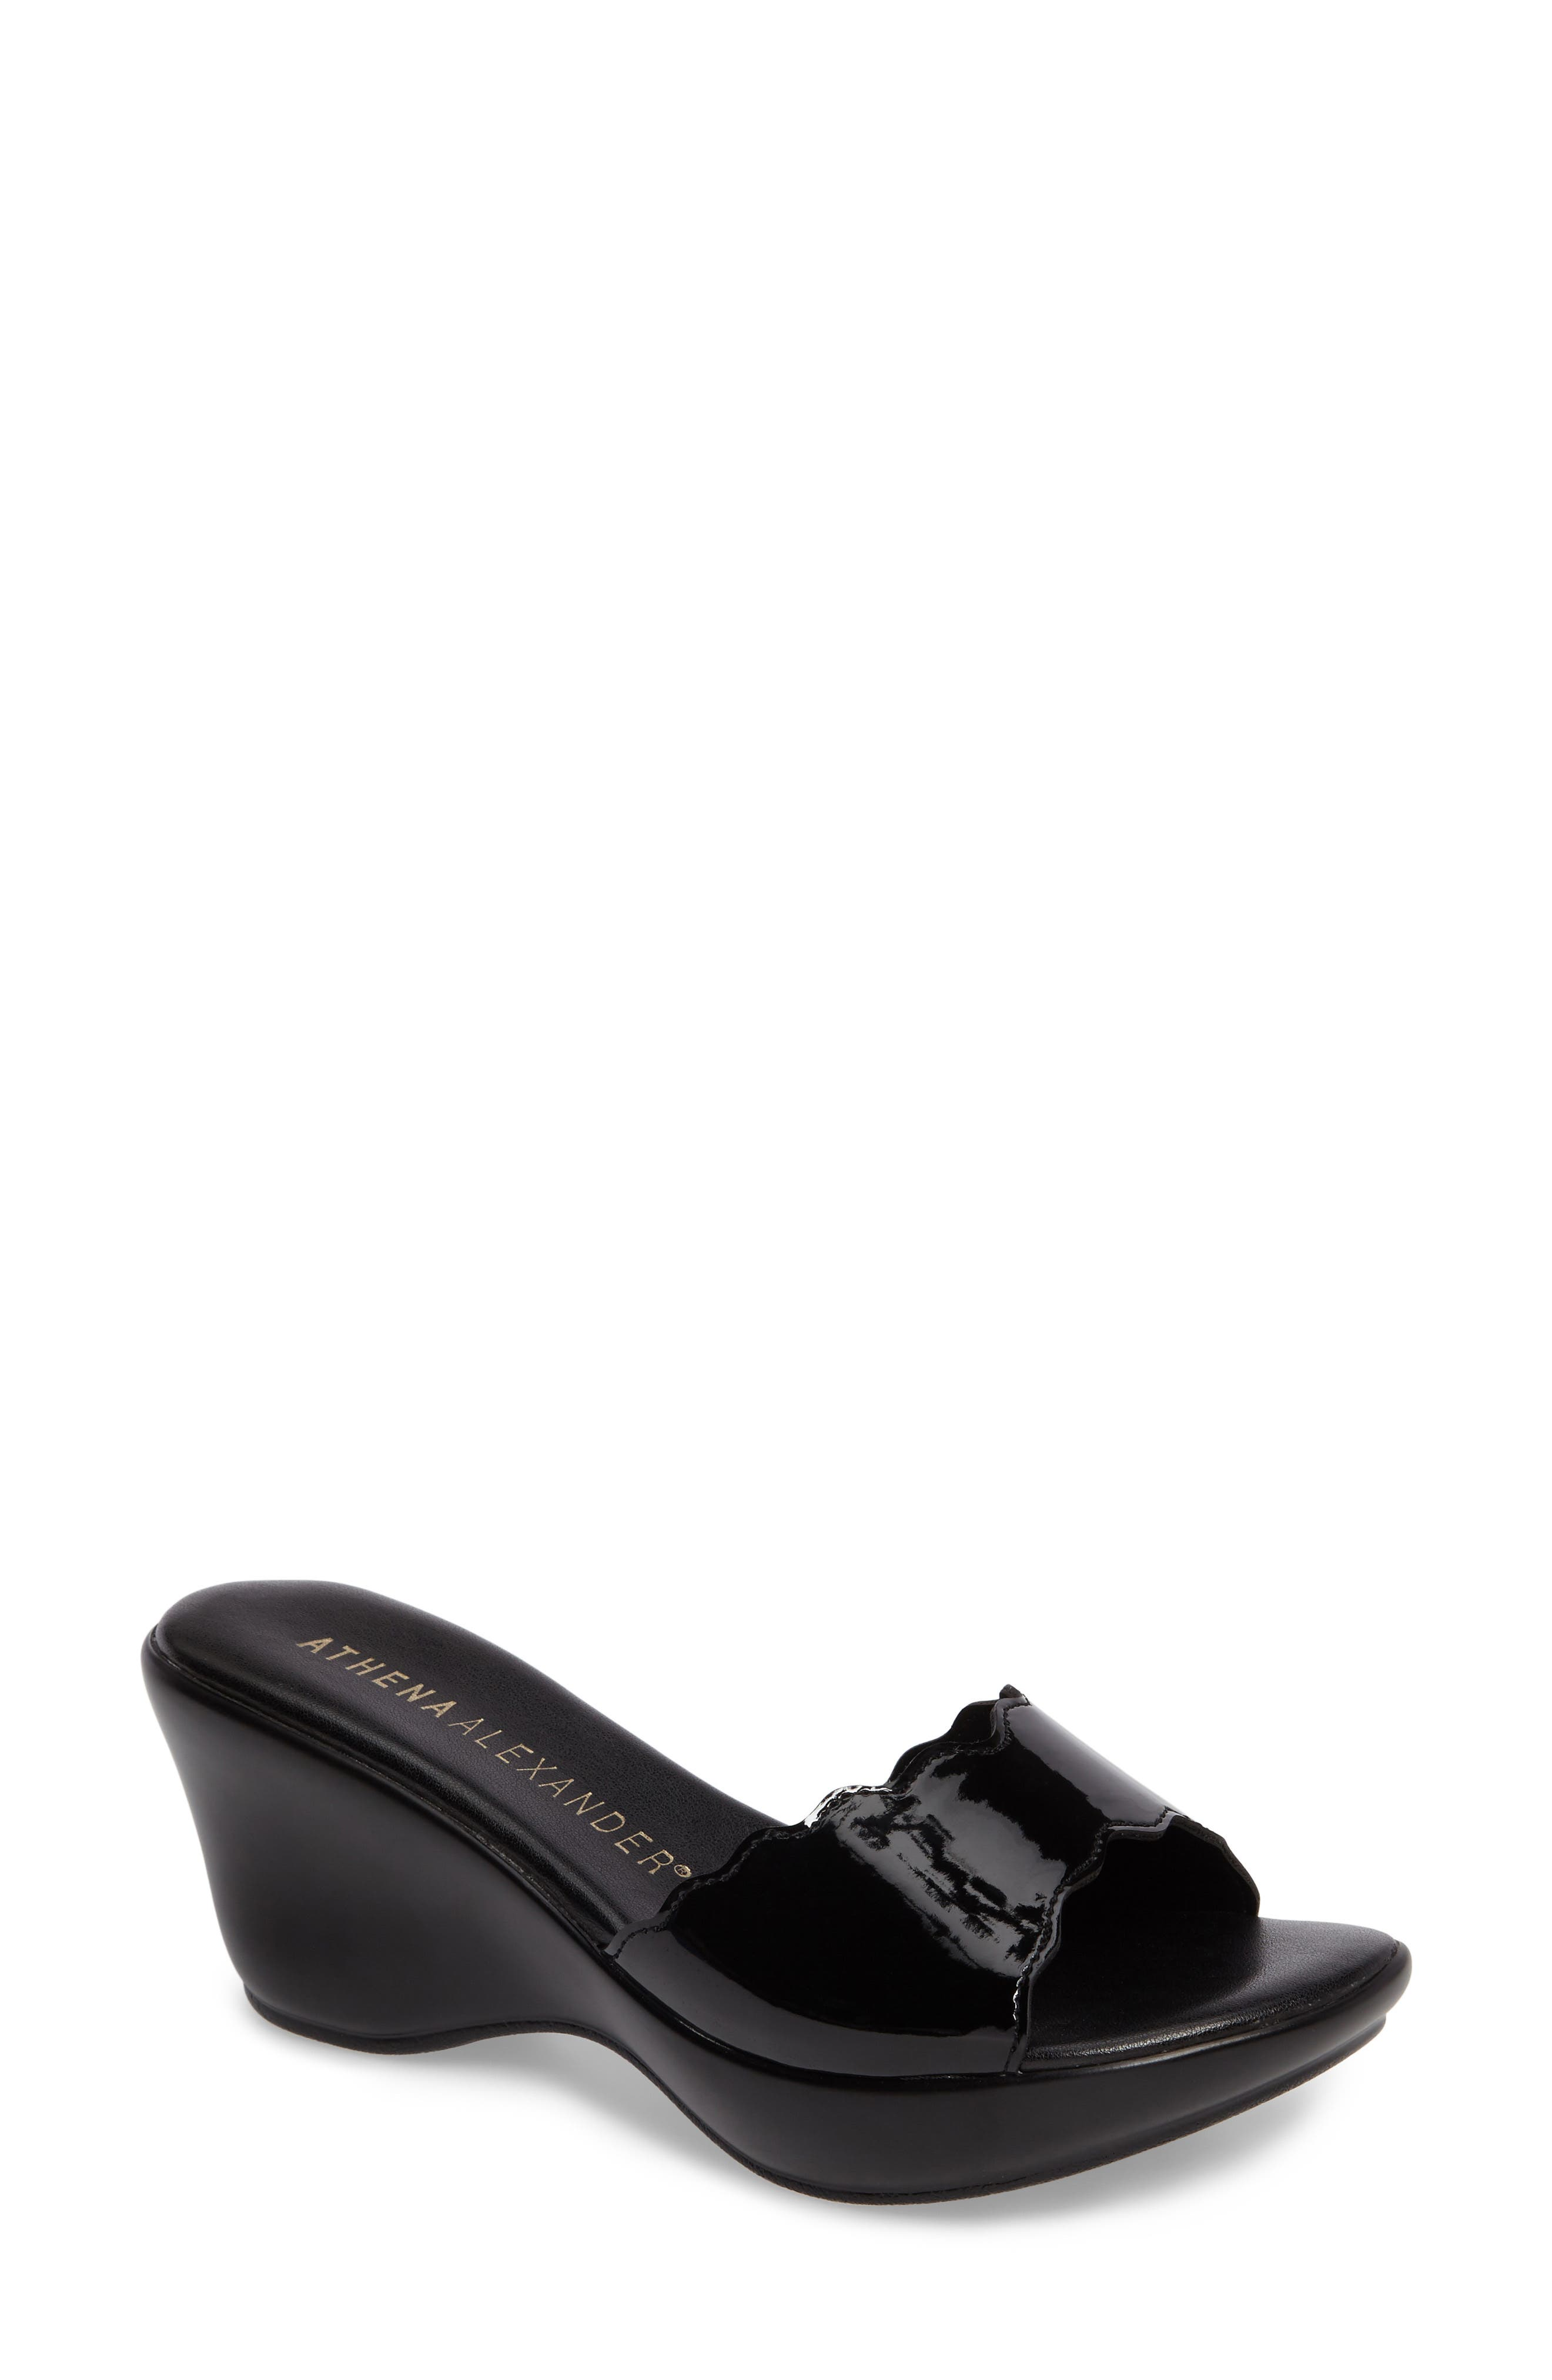 Novva Sandal,                         Main,                         color, Black Synthetic